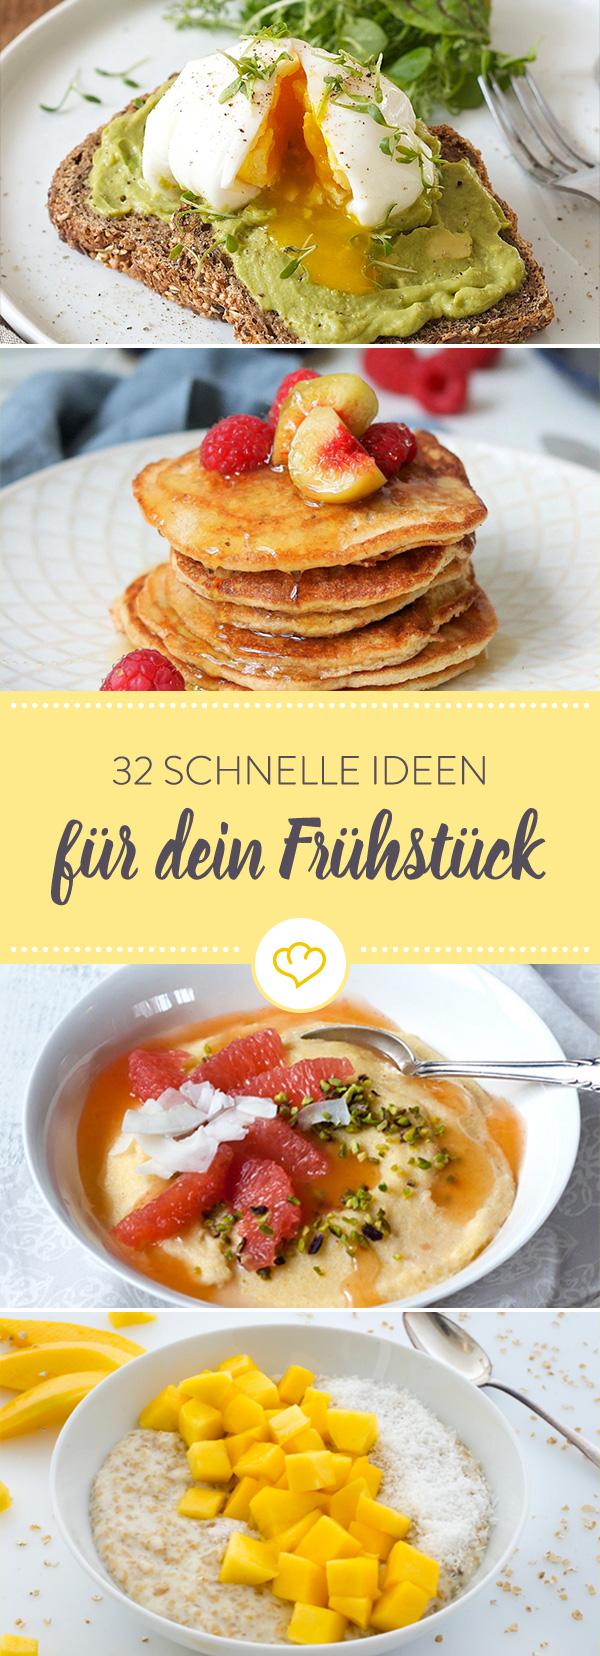 Herzhaftes Frühstück, süßes Frühstück: 5 leckere Rezeptideen